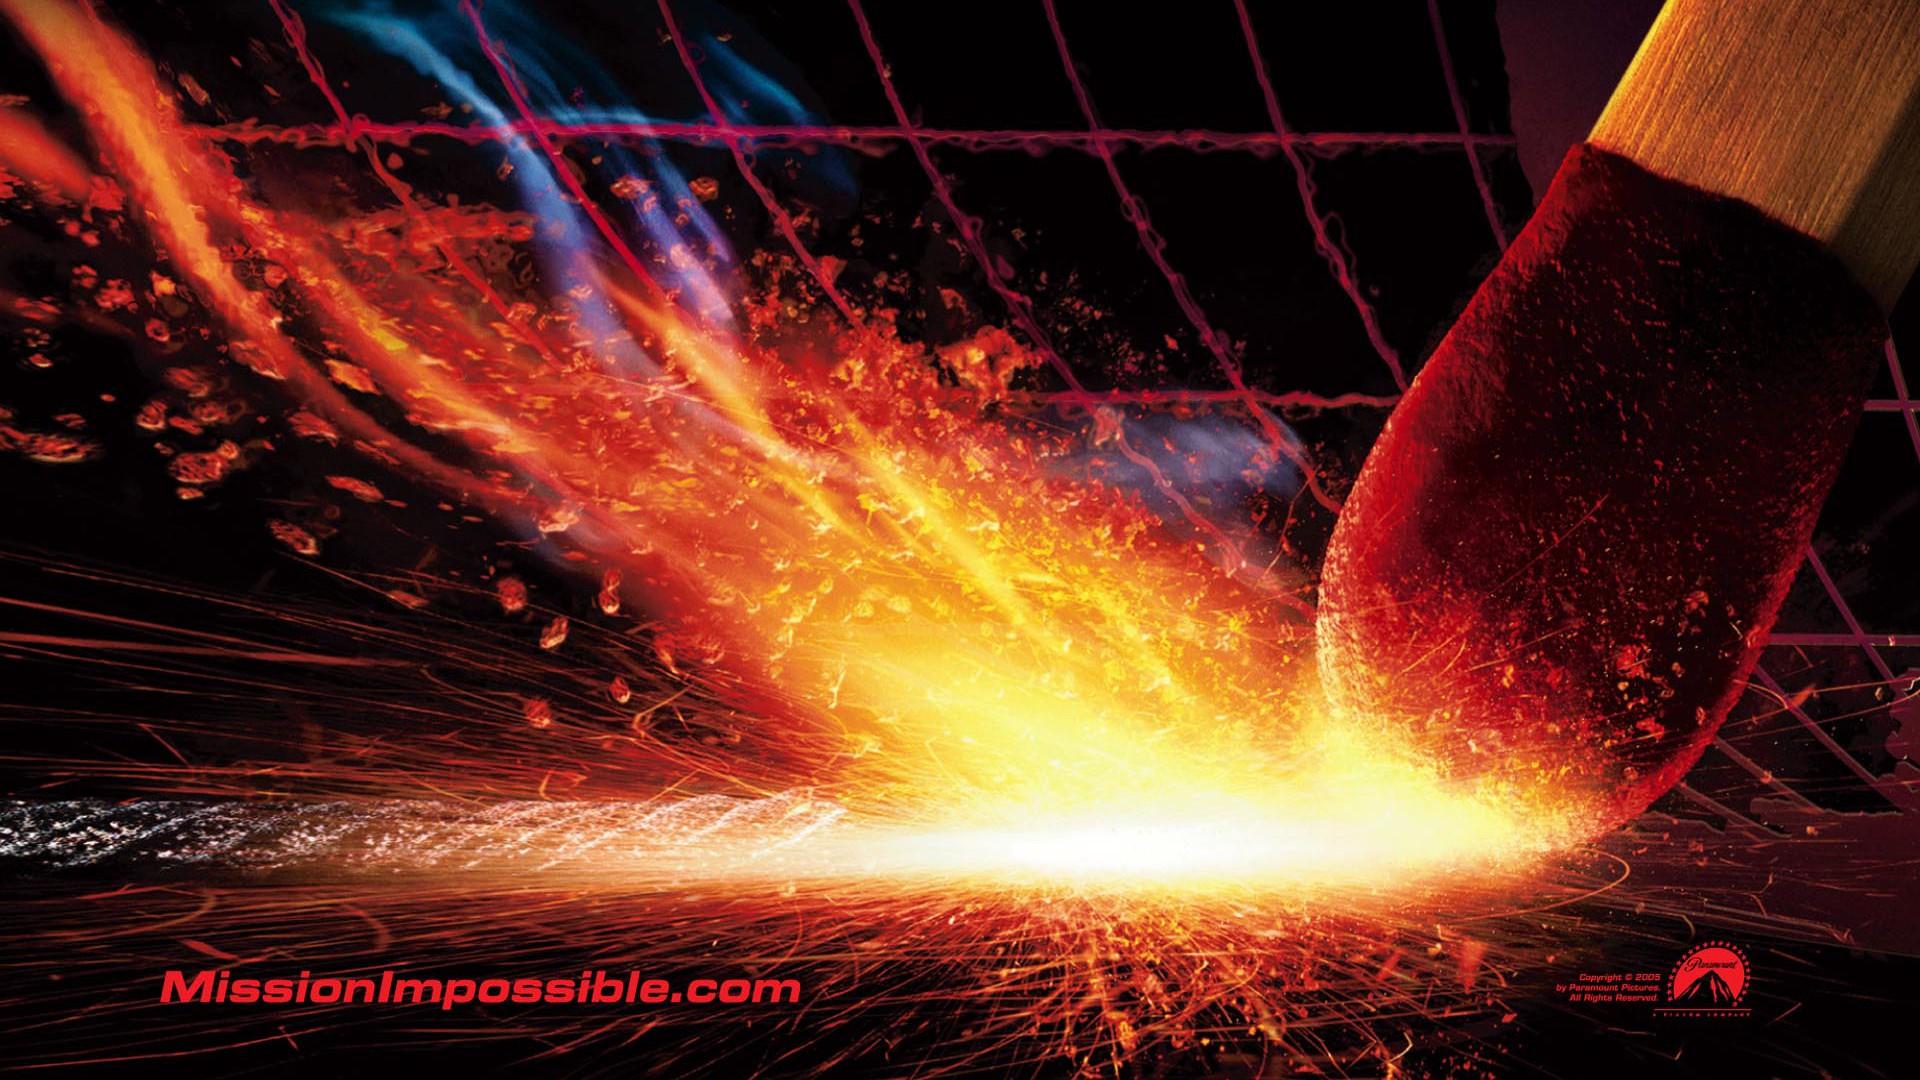 Mission-Impossible-Pozadia-na-plochu